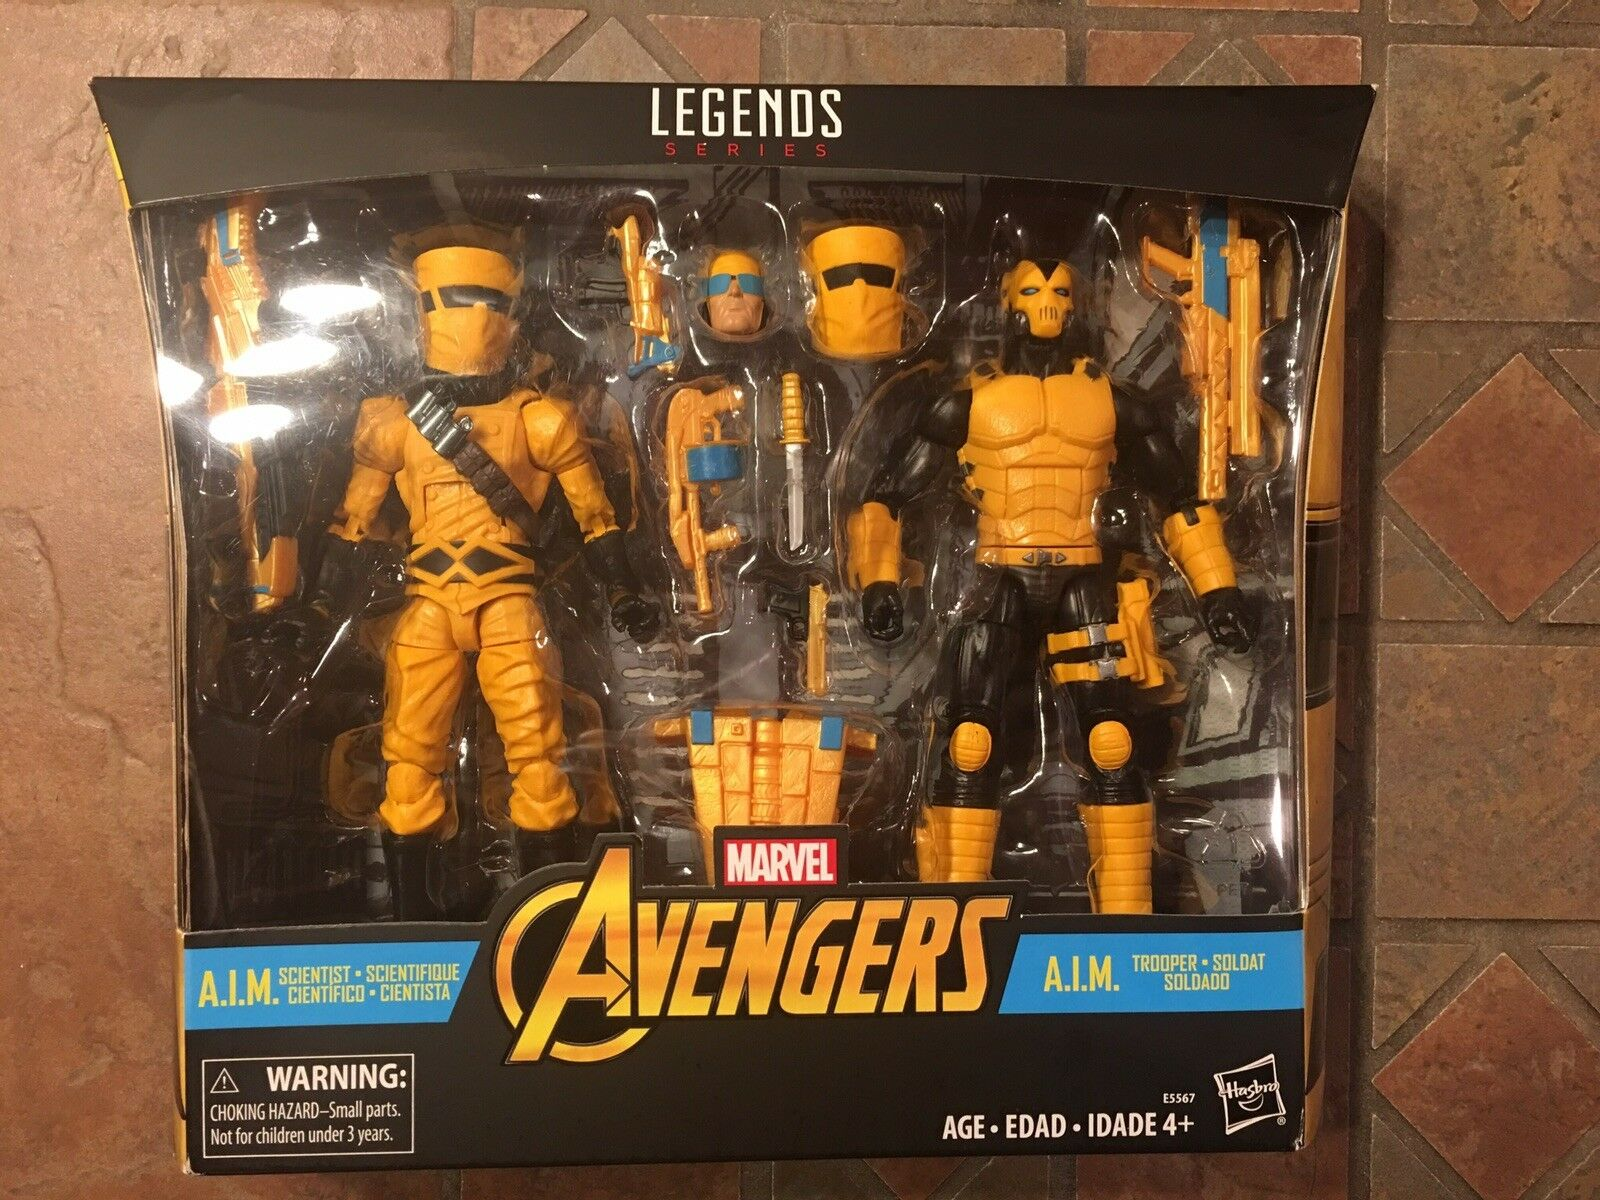 Marvel Leggende A. I.M Scienziato & Aim Trooper Statuetta Due Pezzi Avengers